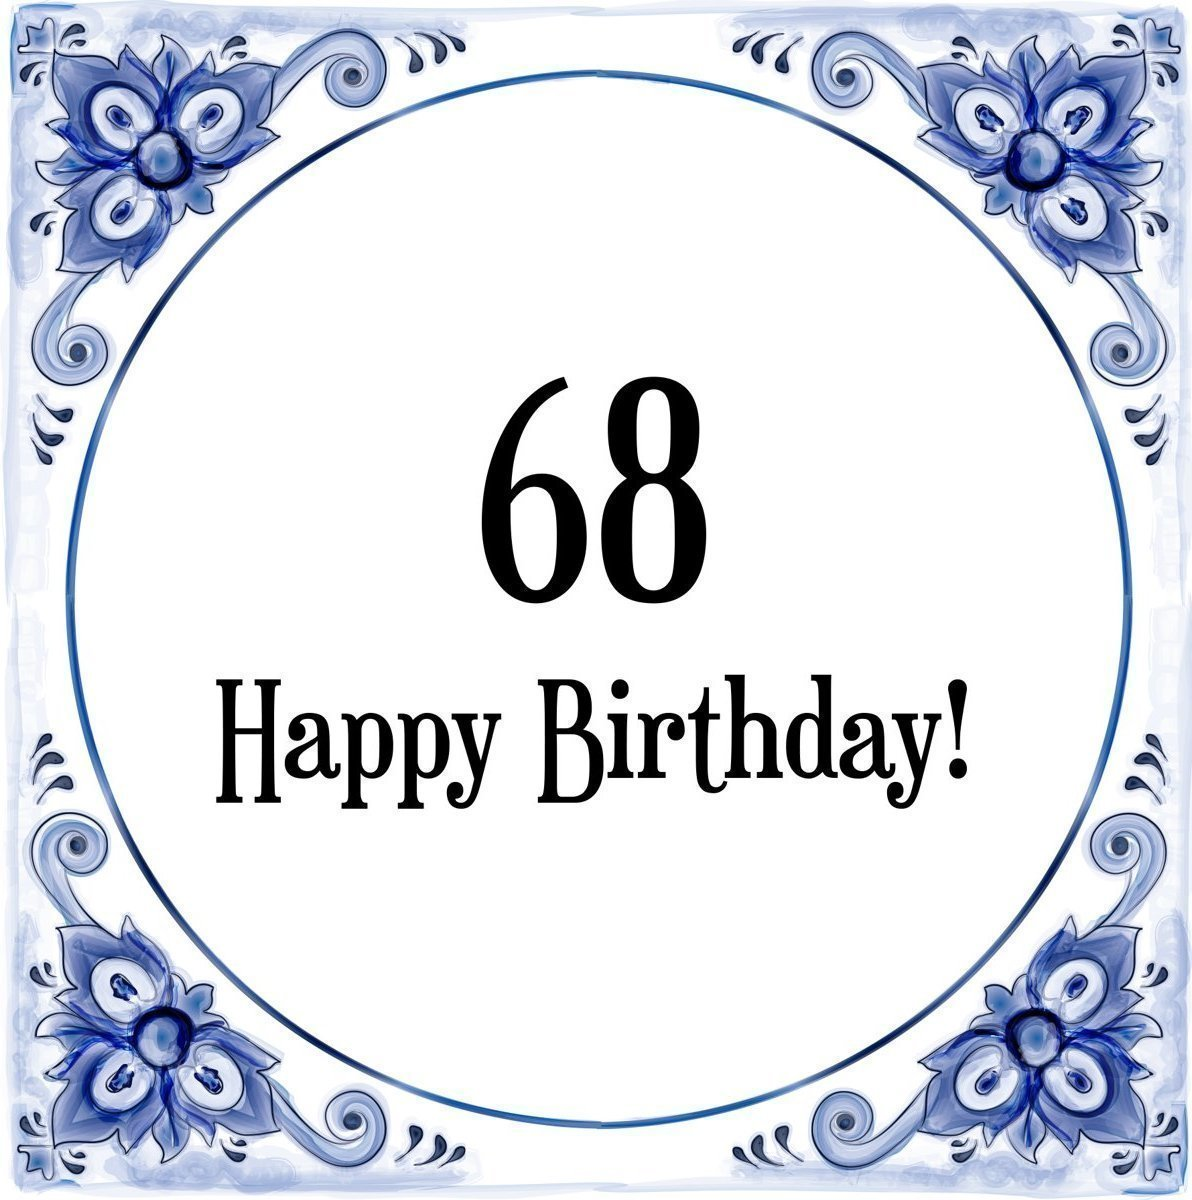 Goedkoopste Verjaardag Tegeltje Met Spreuk 68 Jaar Happy Birthday